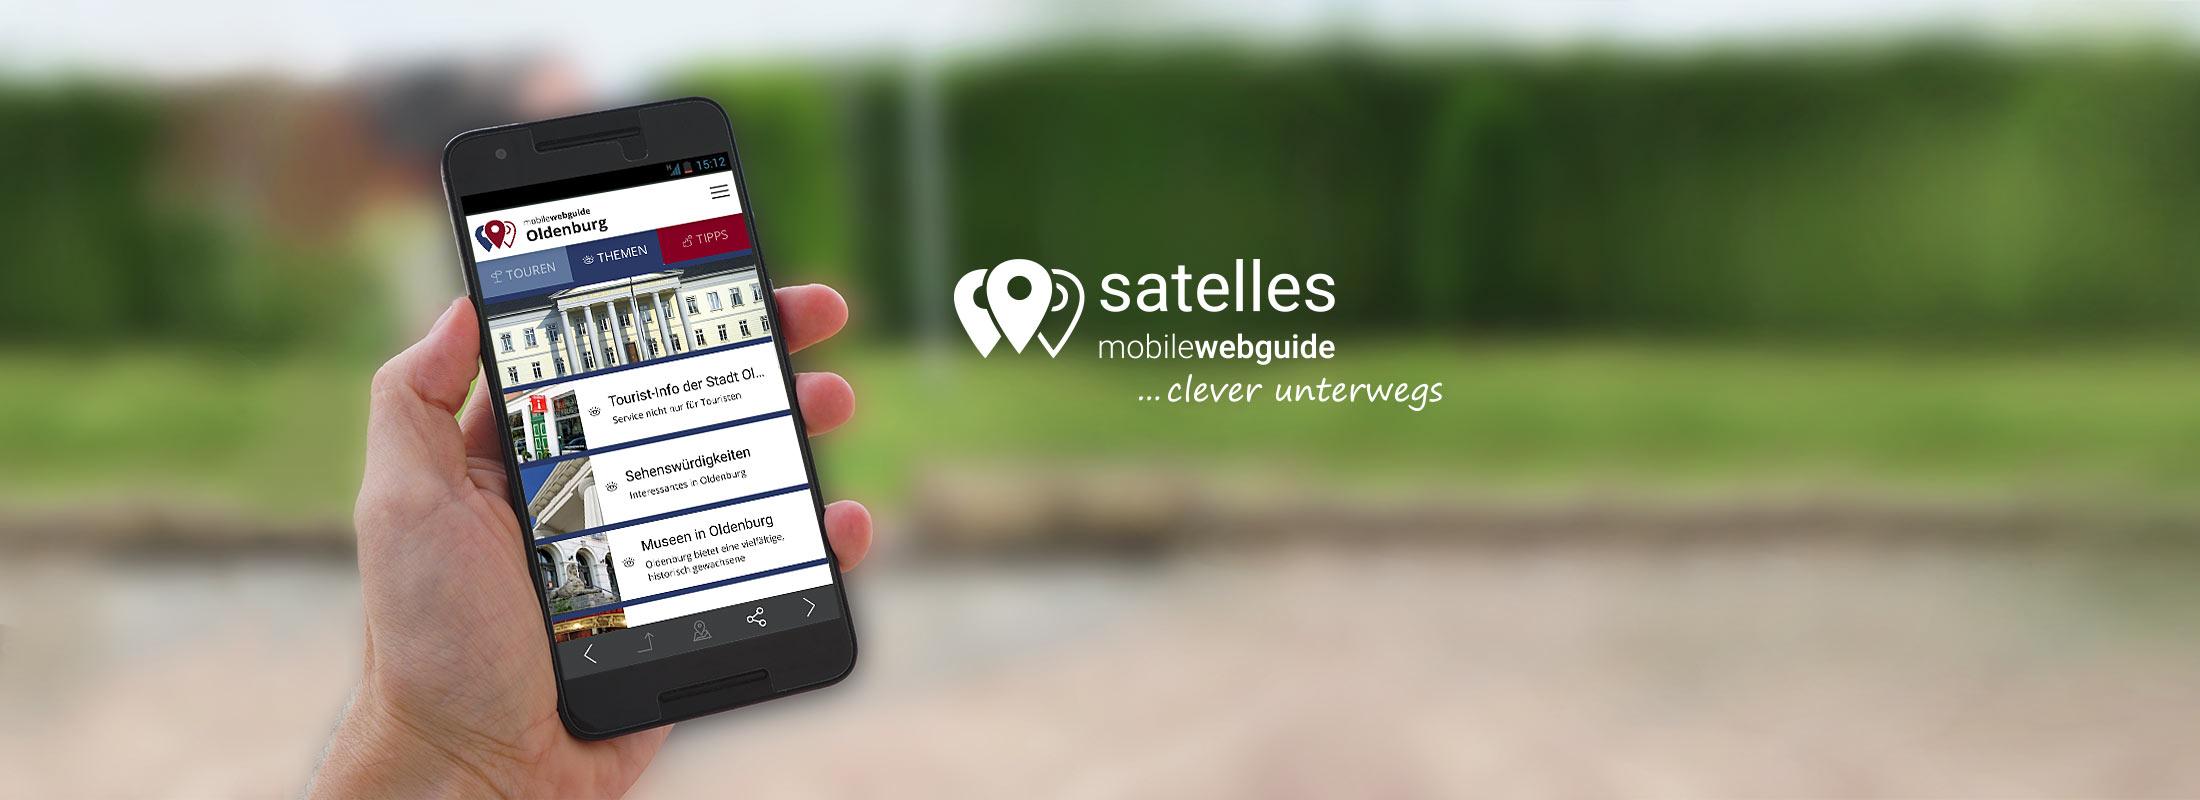 satelles mobilewebguide: Progressiv Web App